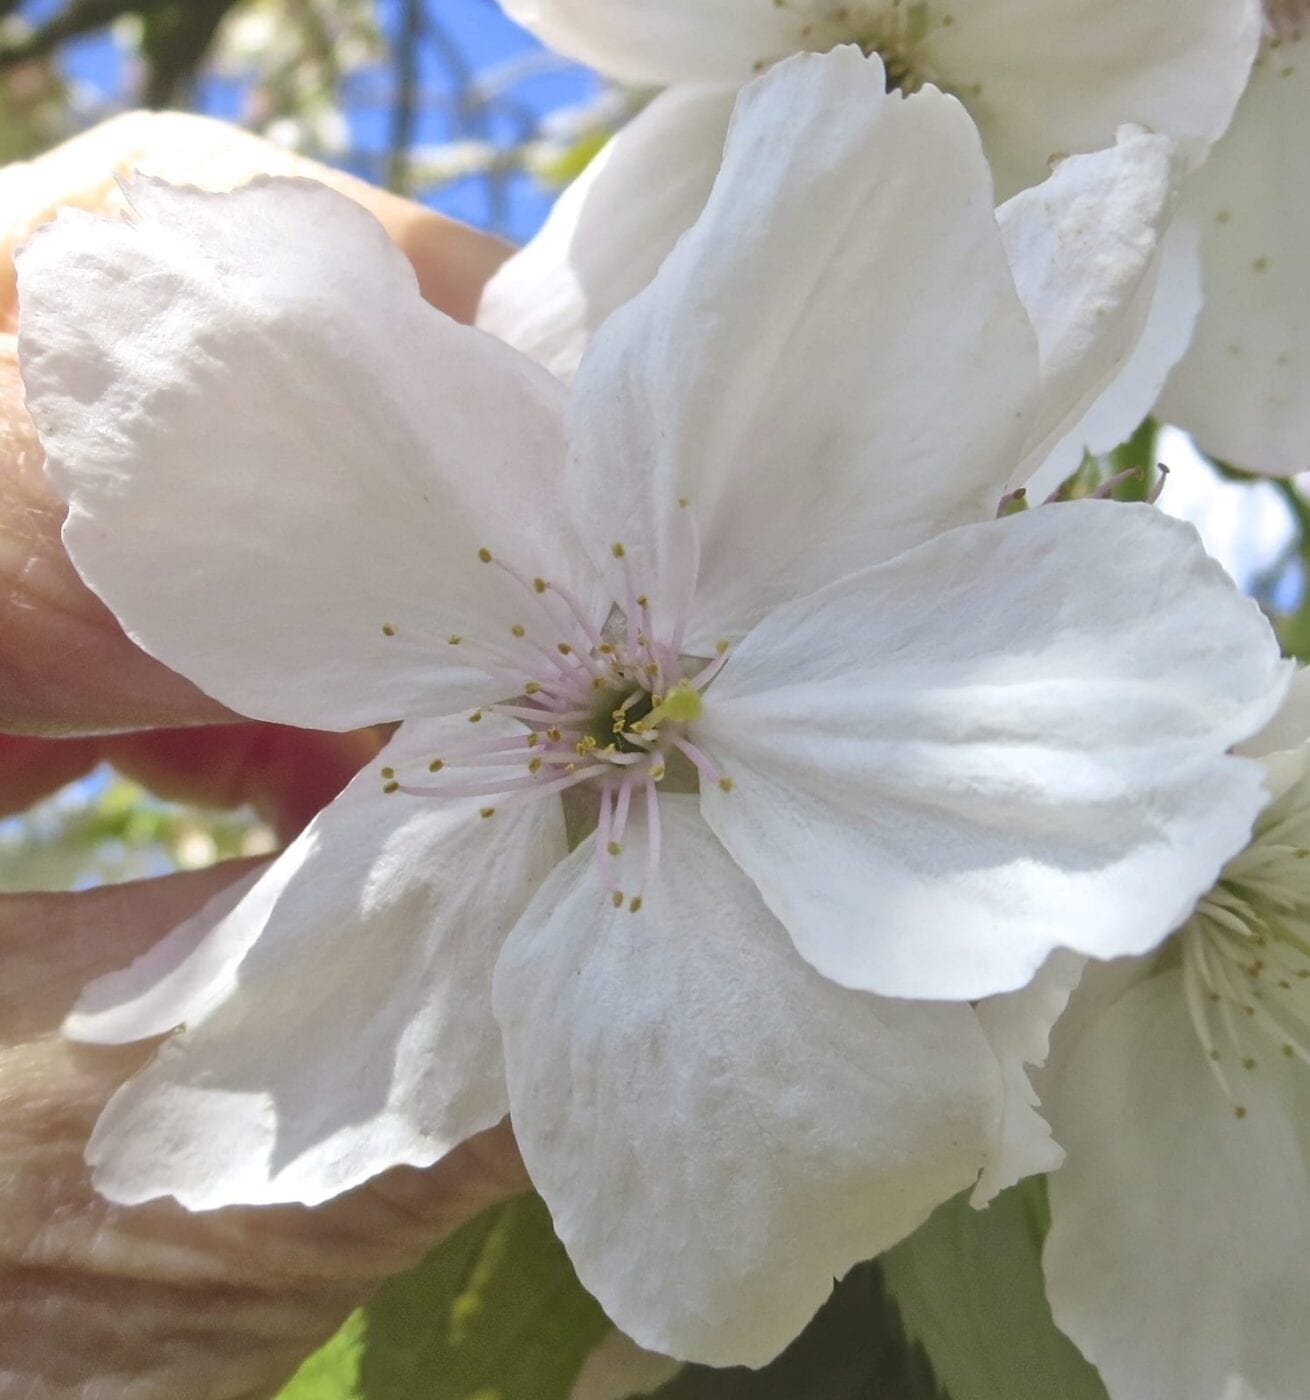 'Tai Haku' Cherry flower